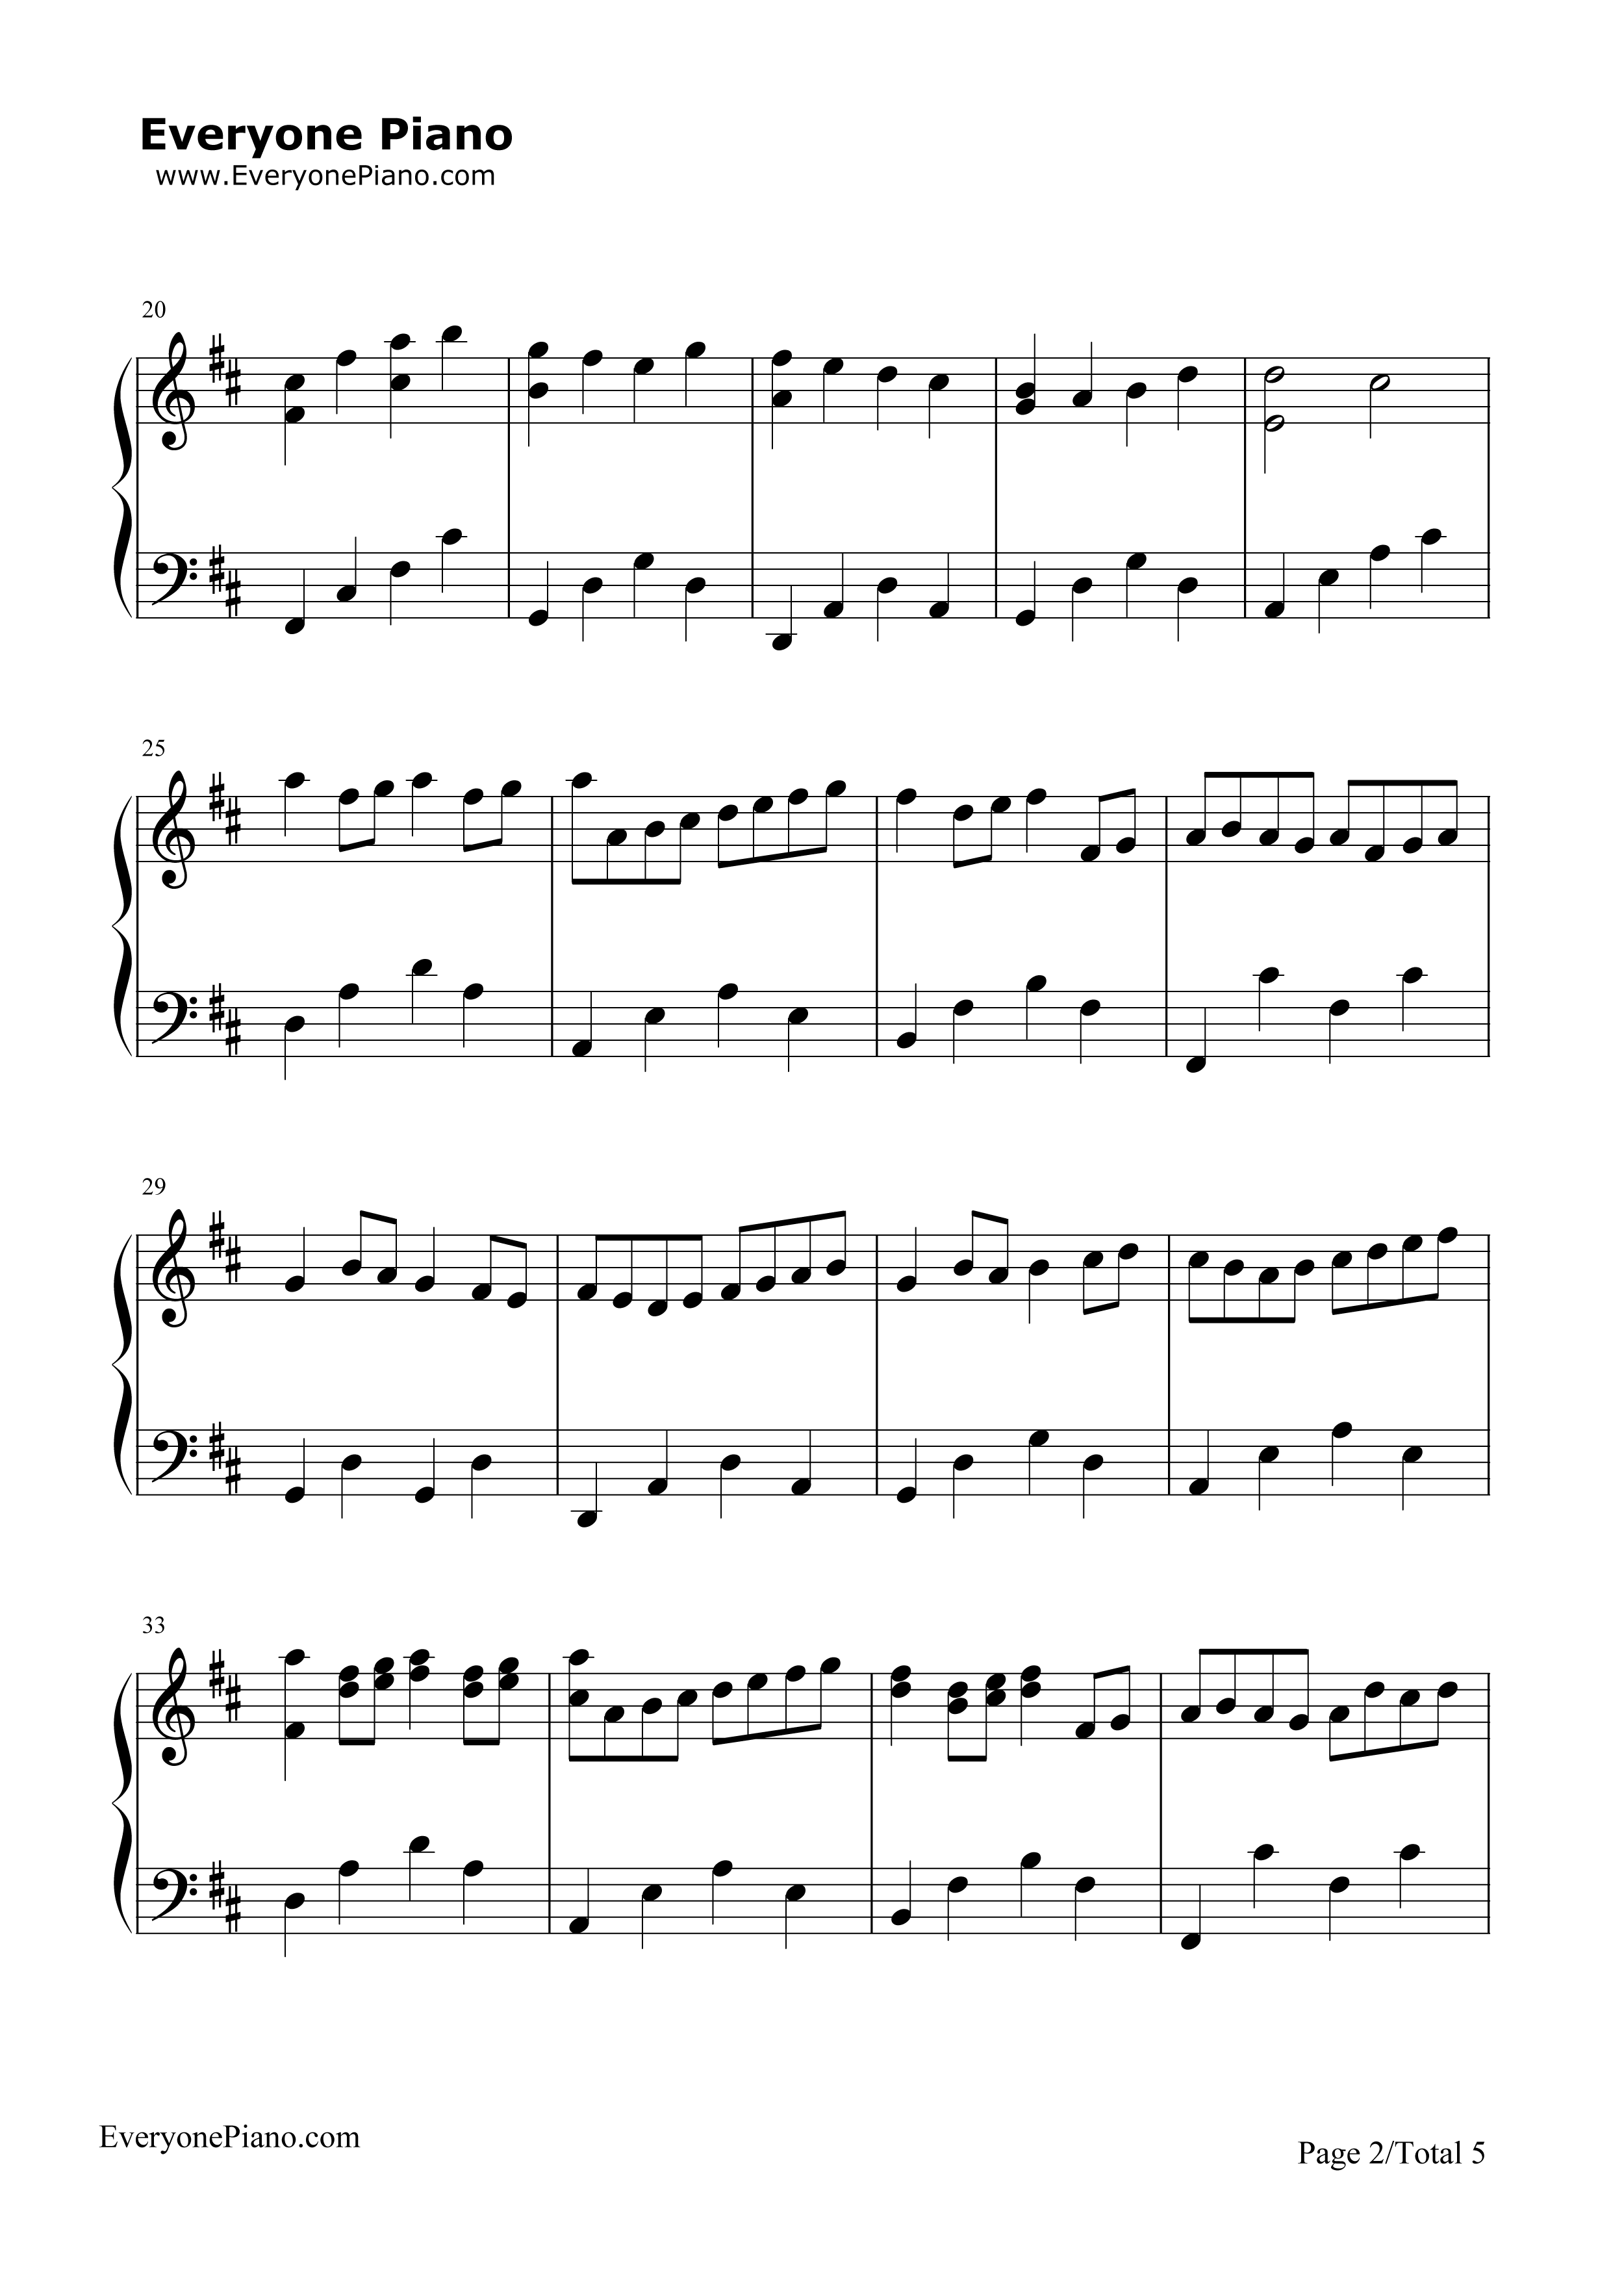 D大调卡农 帕赫贝尔五线谱预览 EOP在线乐谱架